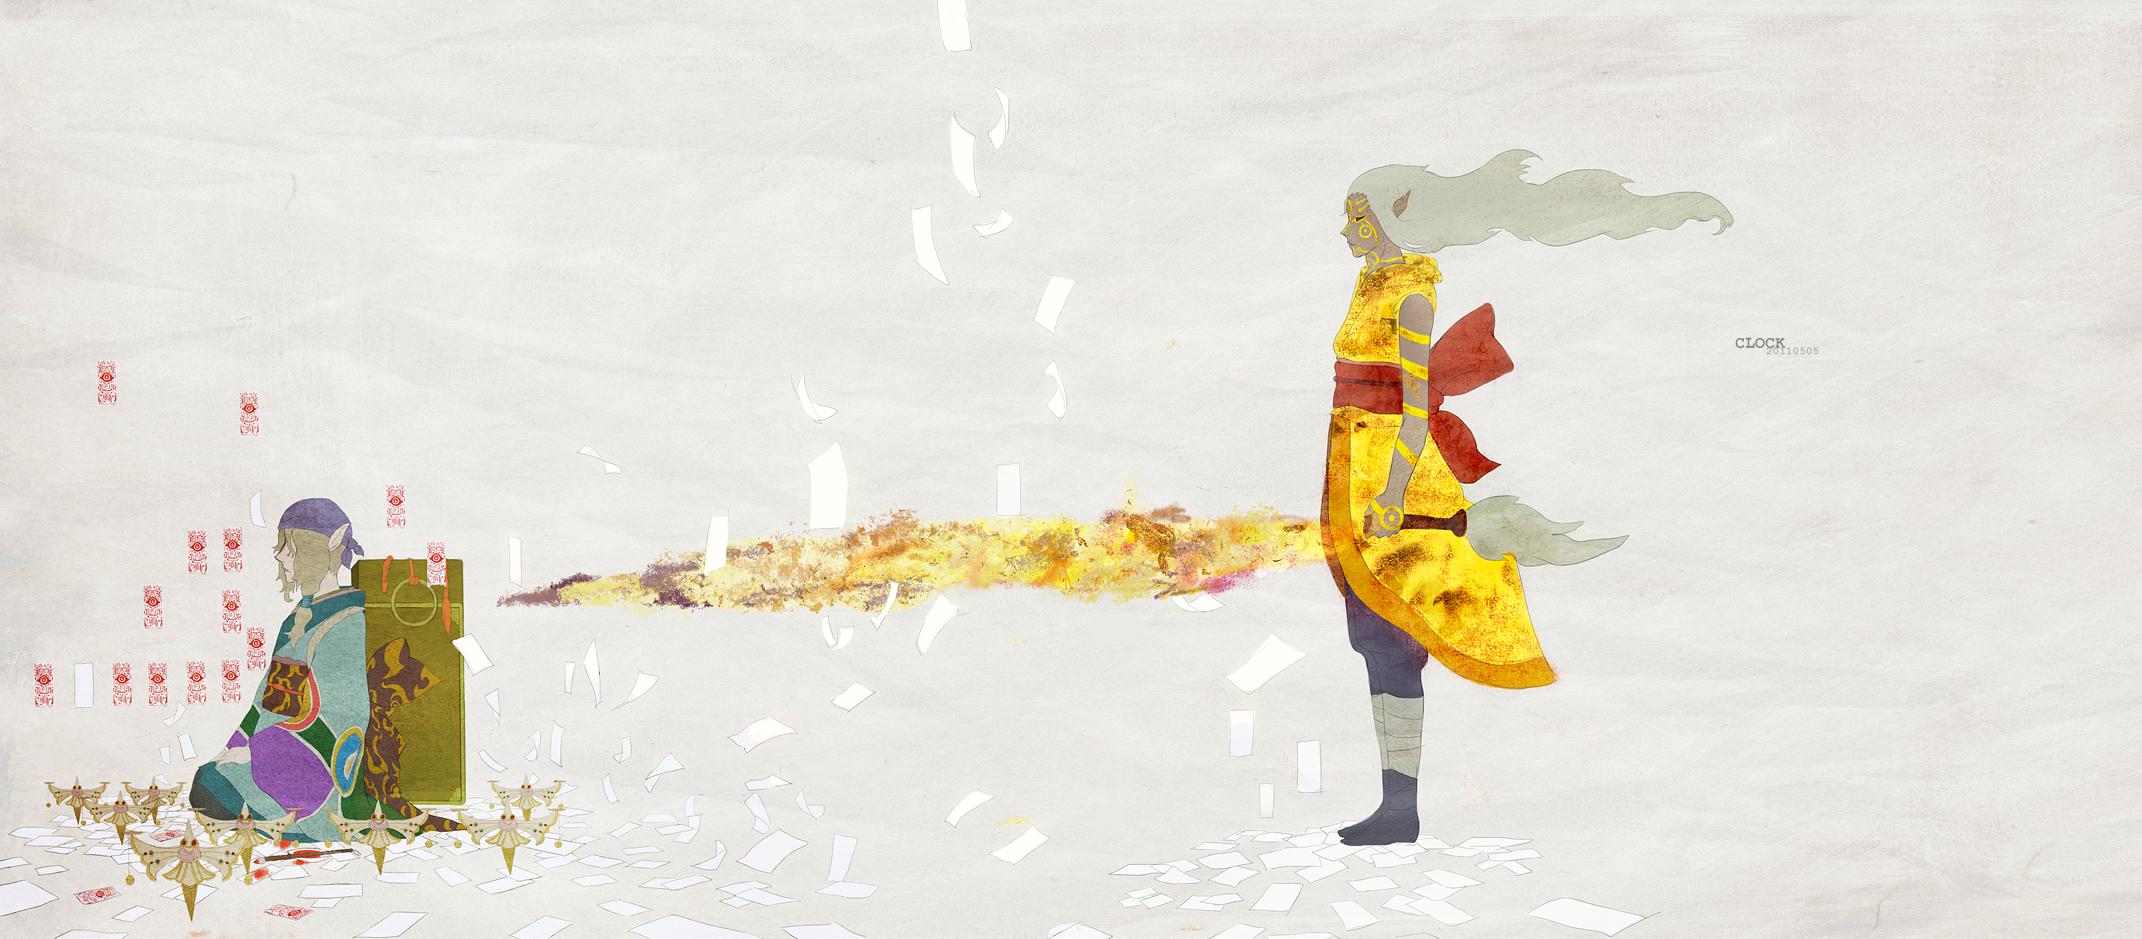 Mononoke wallpaper and background image 2142x939 id - Mononoke anime wallpaper ...